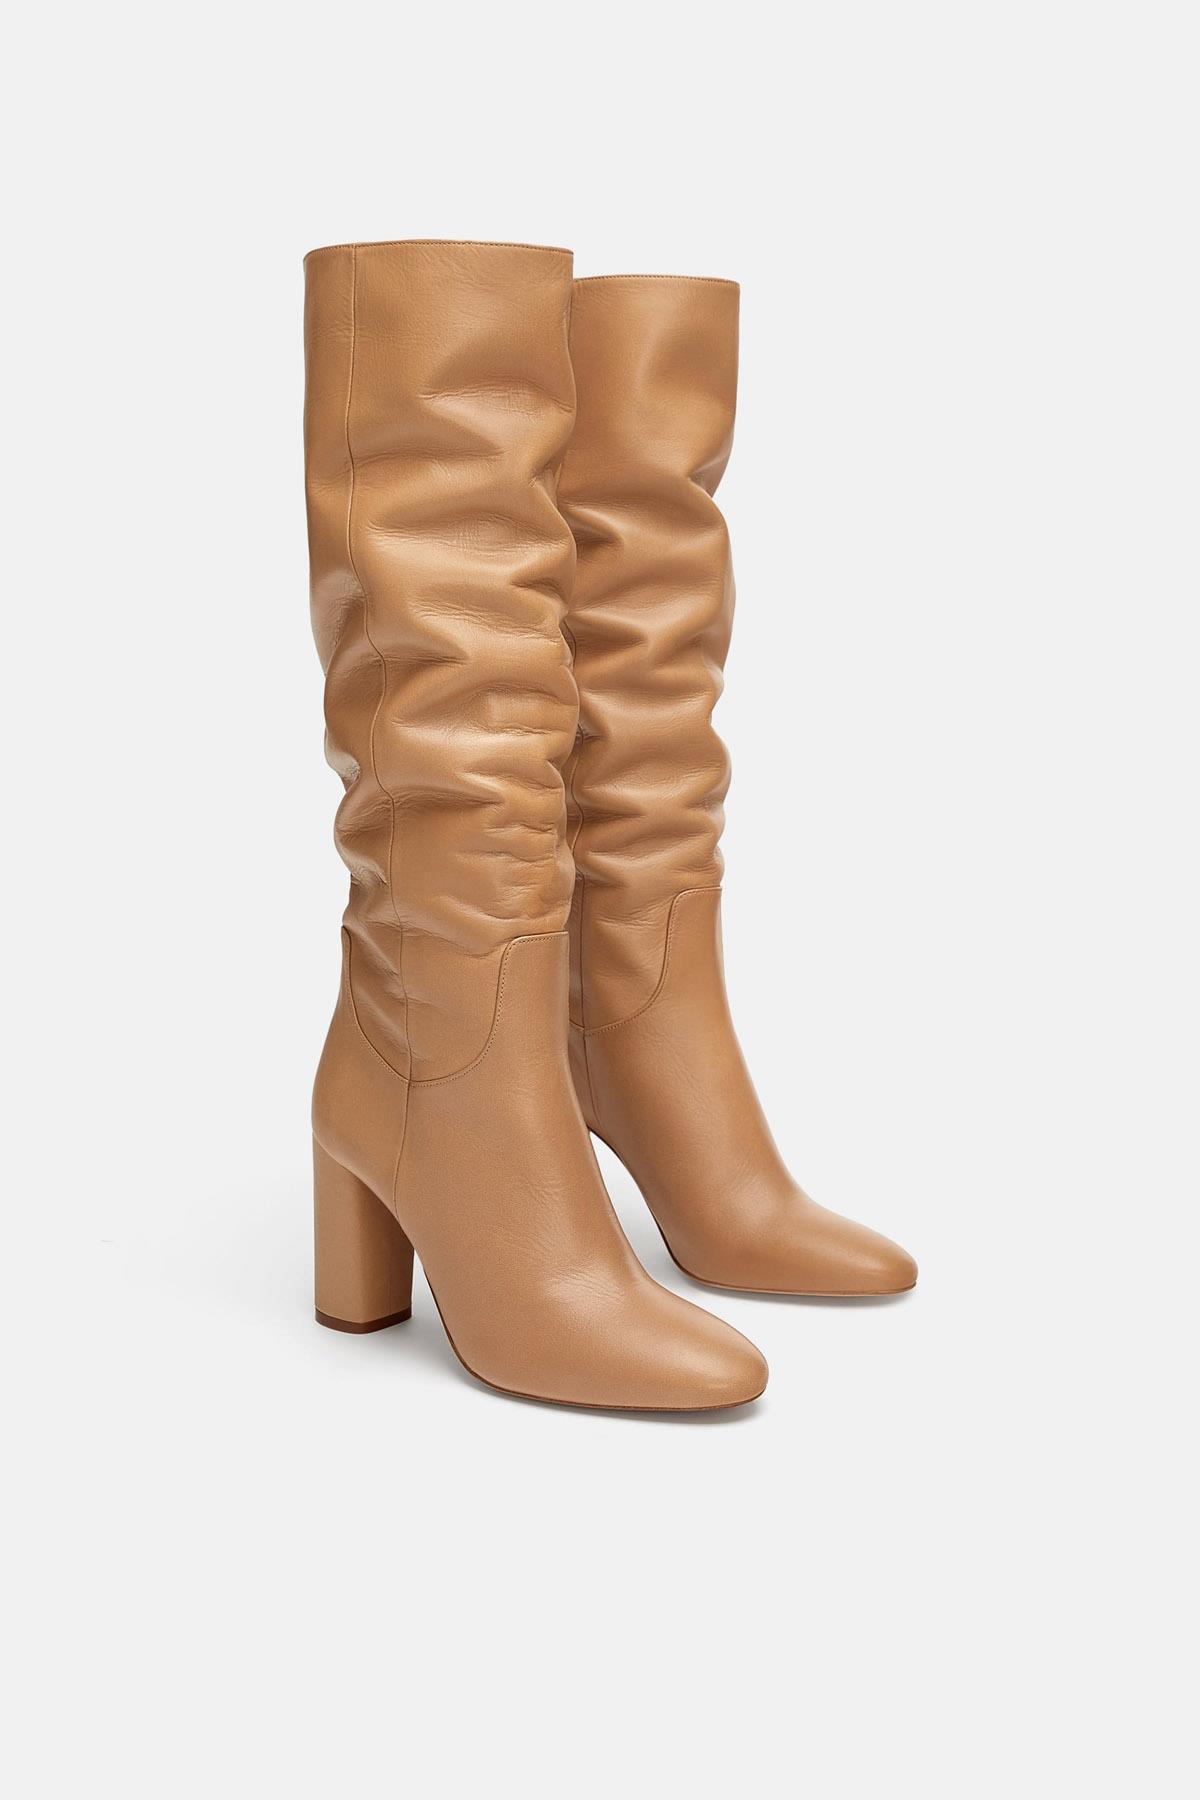 b06d661d8 botas-altas-moda-rebajas-arrugadas-setentas. Las botas altas de